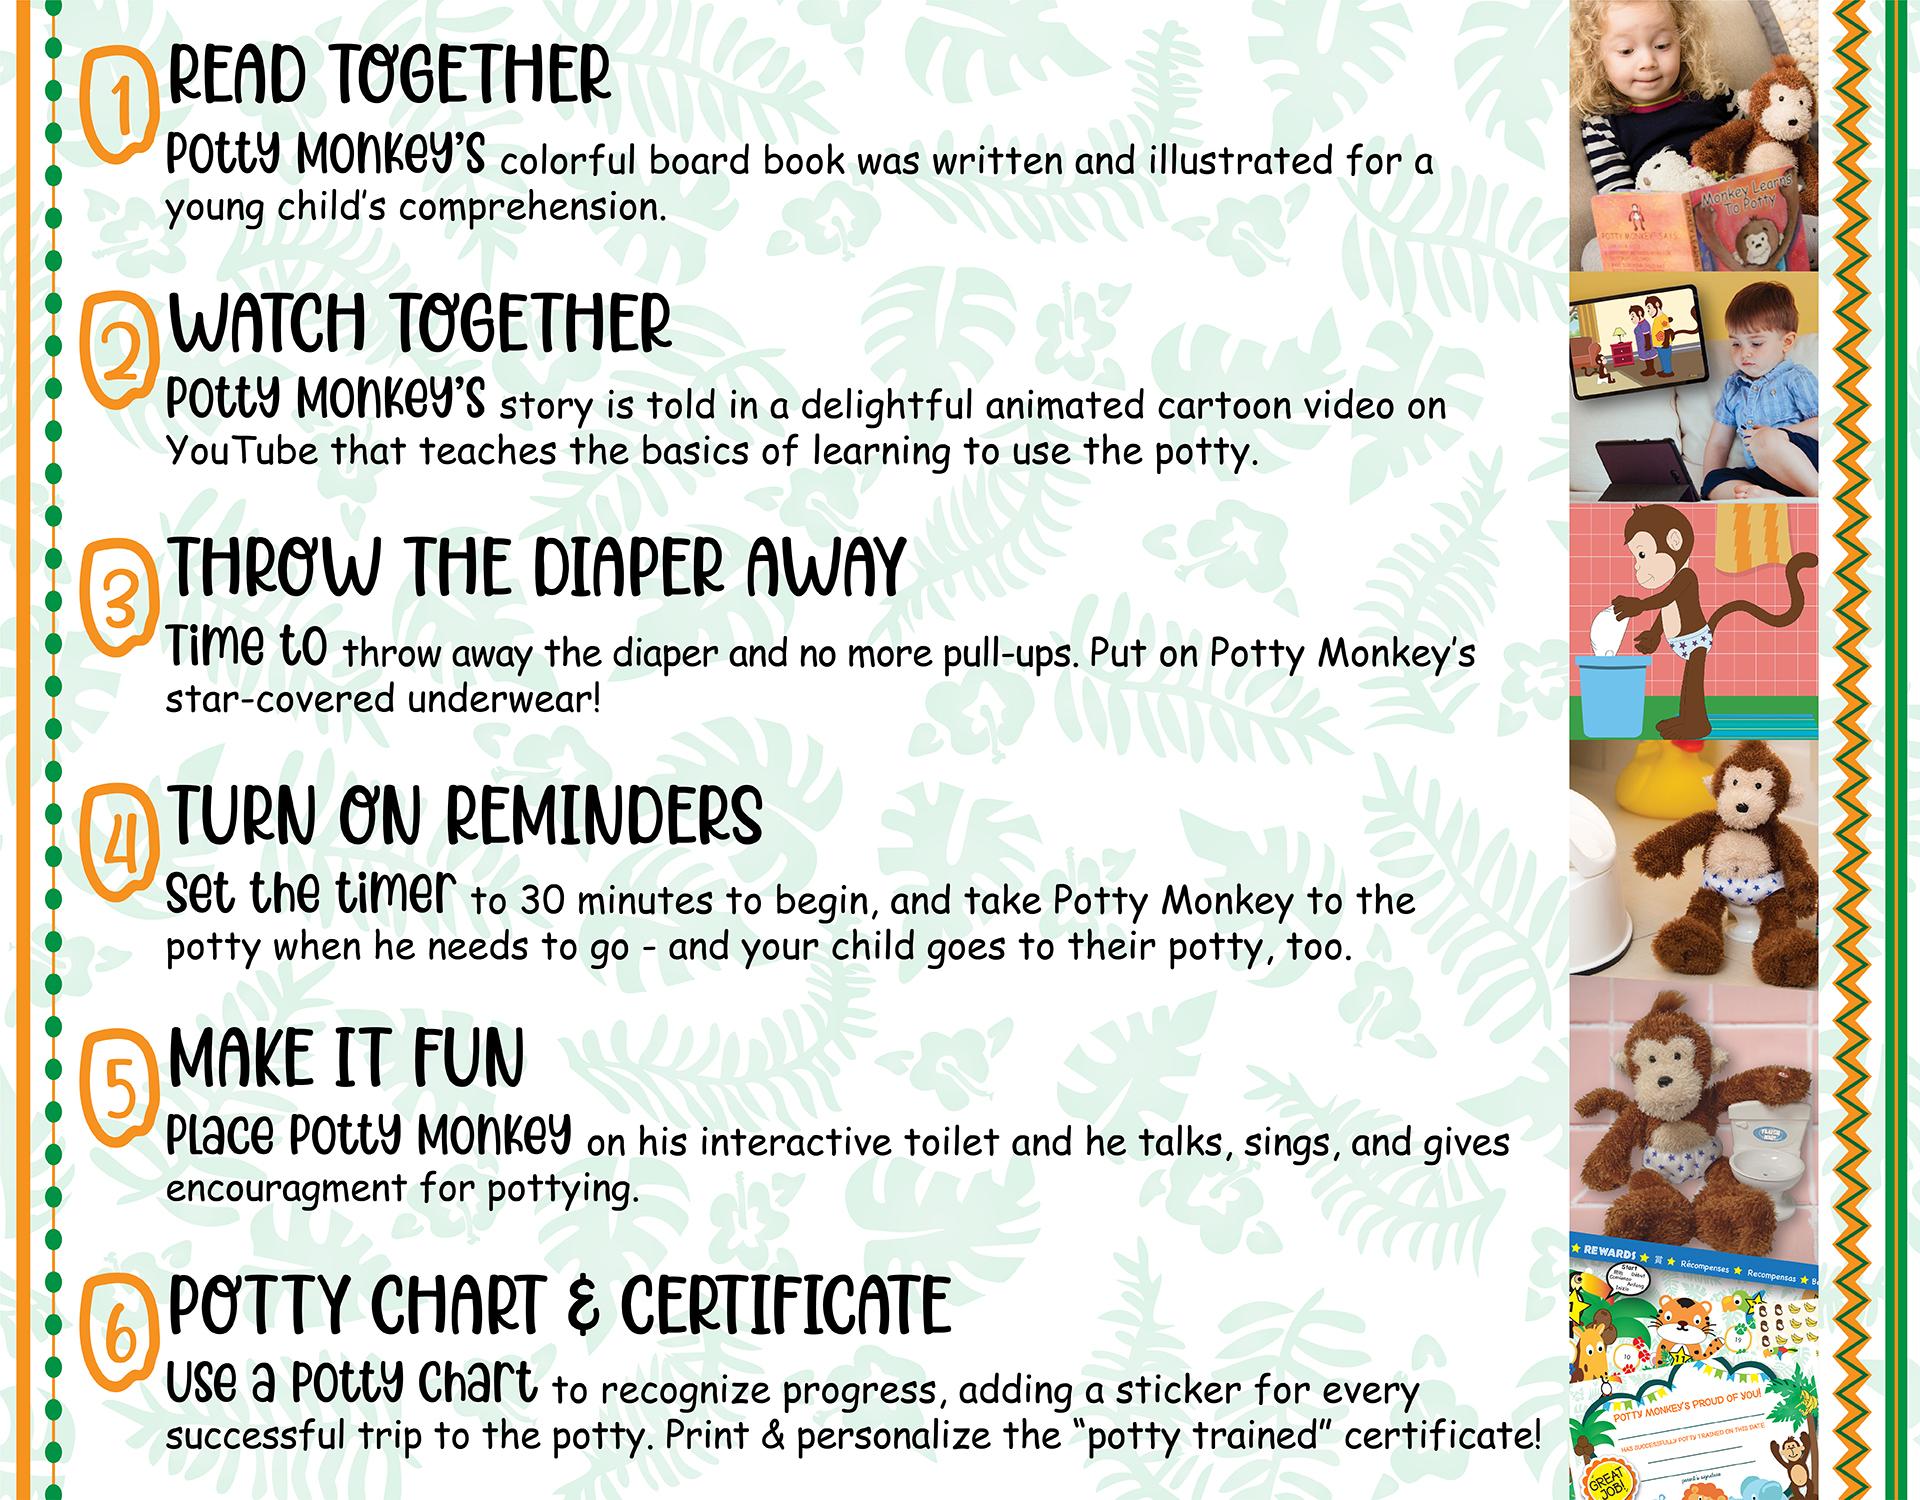 Potty Monkey system in 6 steps